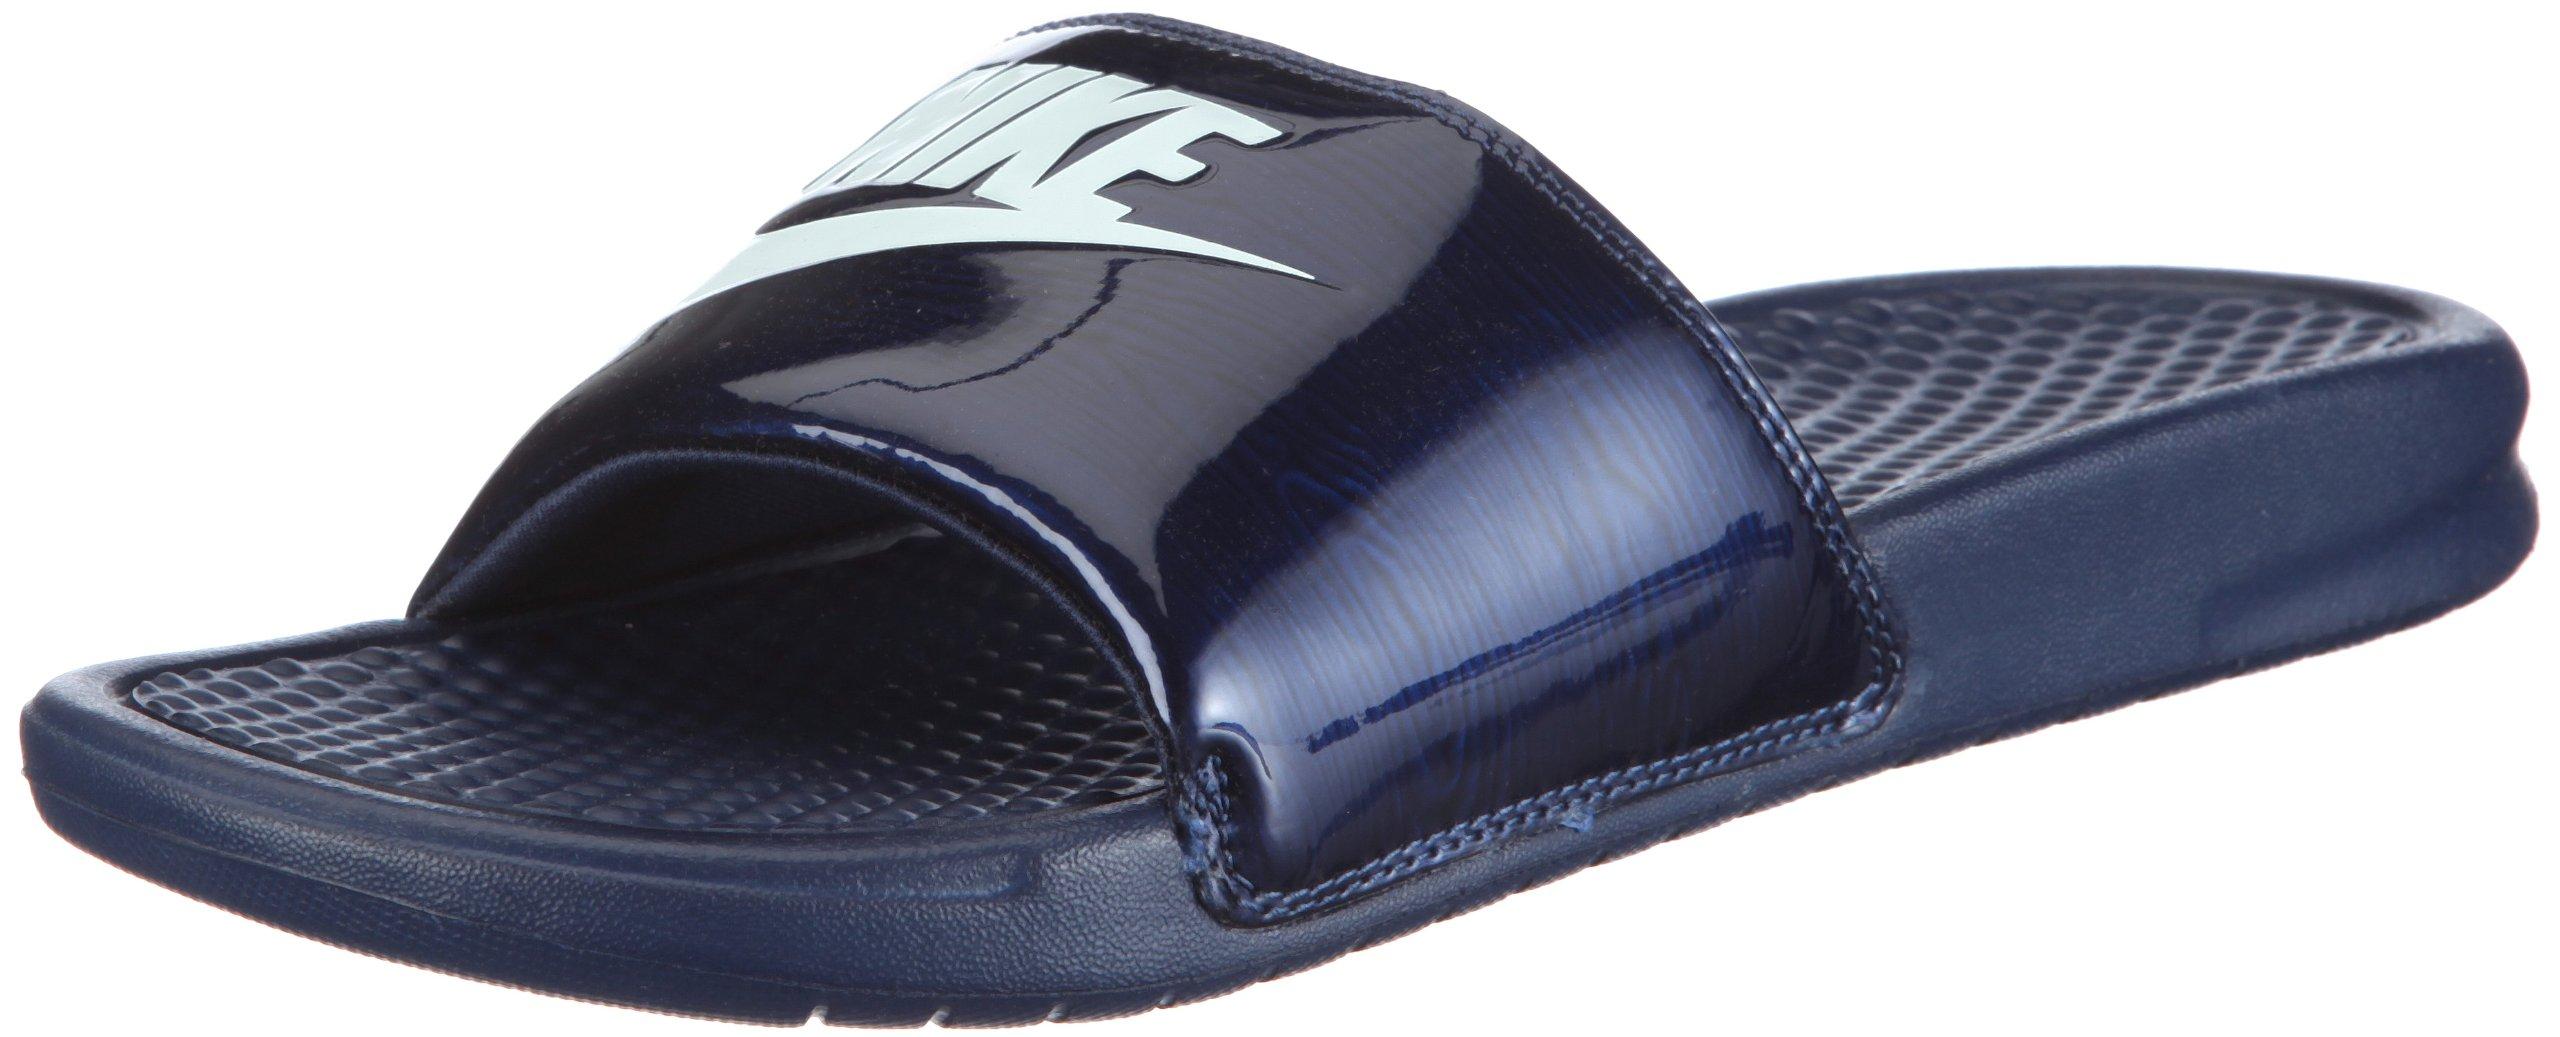 NIKE Men's Benassi Just Do It Athletic Sandal, Midnight Navy/Windchill, 11 D US by NIKE